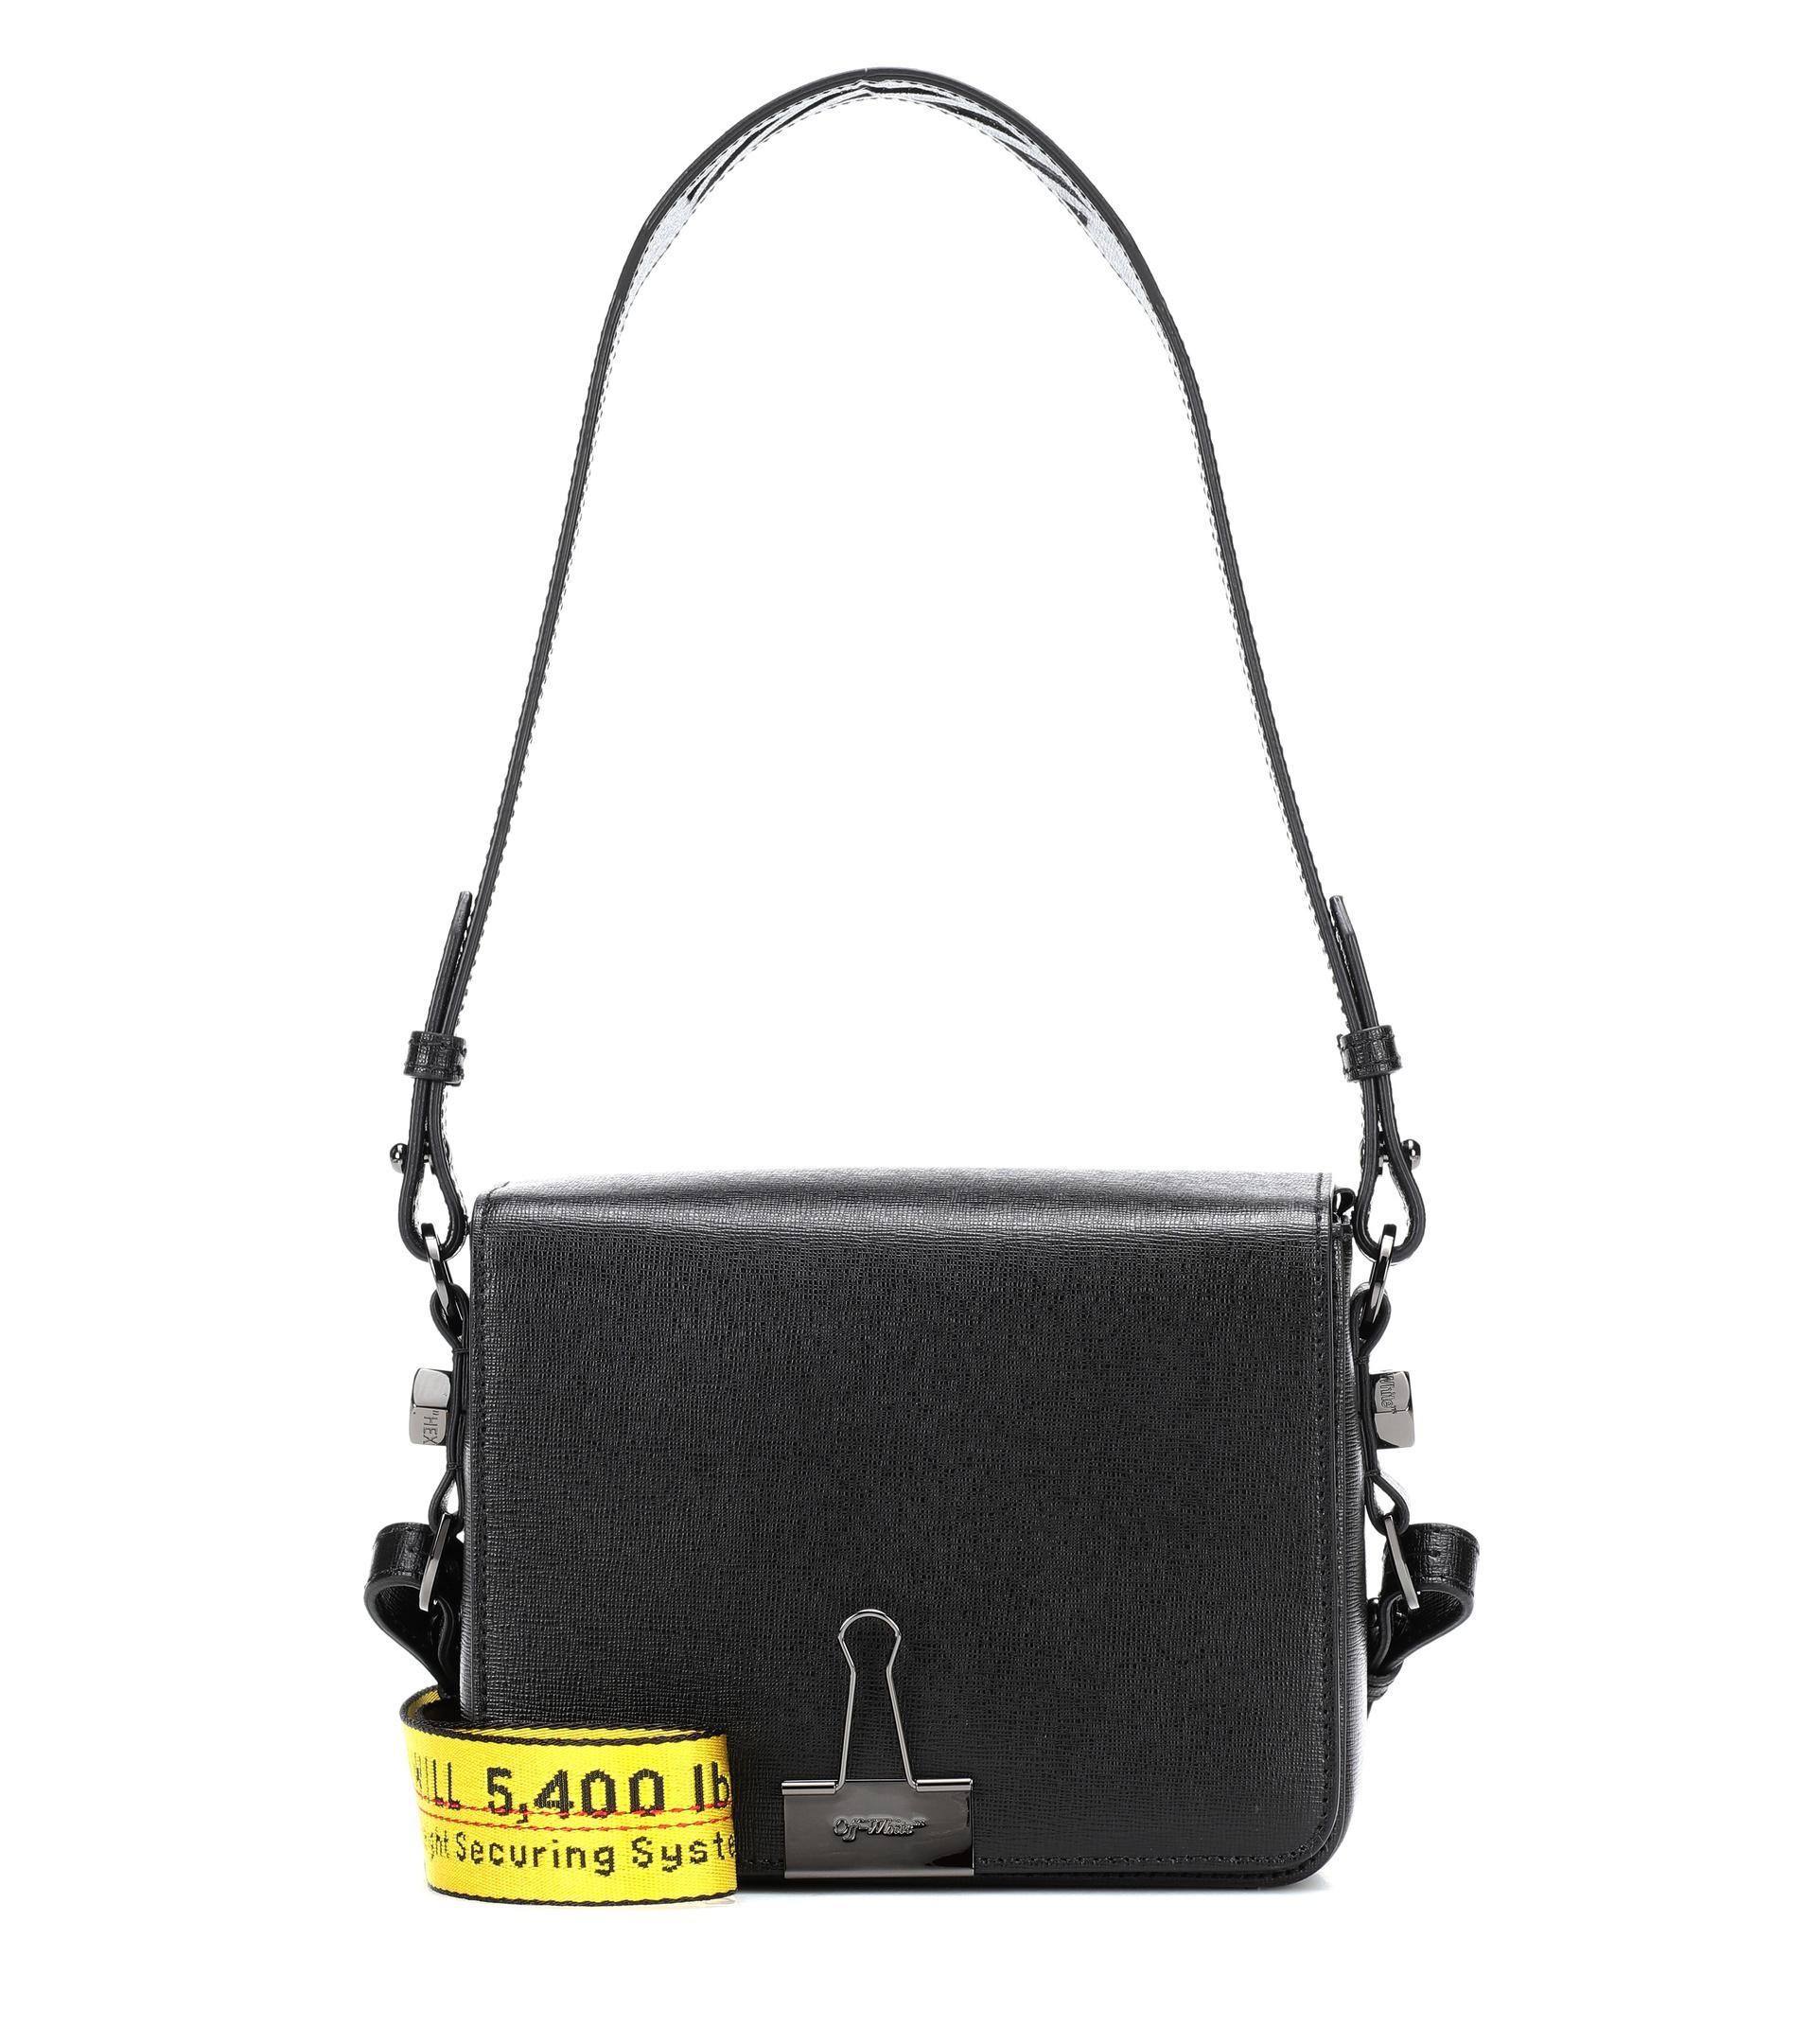 aca7fabb2a1f36 Off-White c/o Virgil Abloh - Black Binder Clip Leather Shoulder Bag -. View  fullscreen